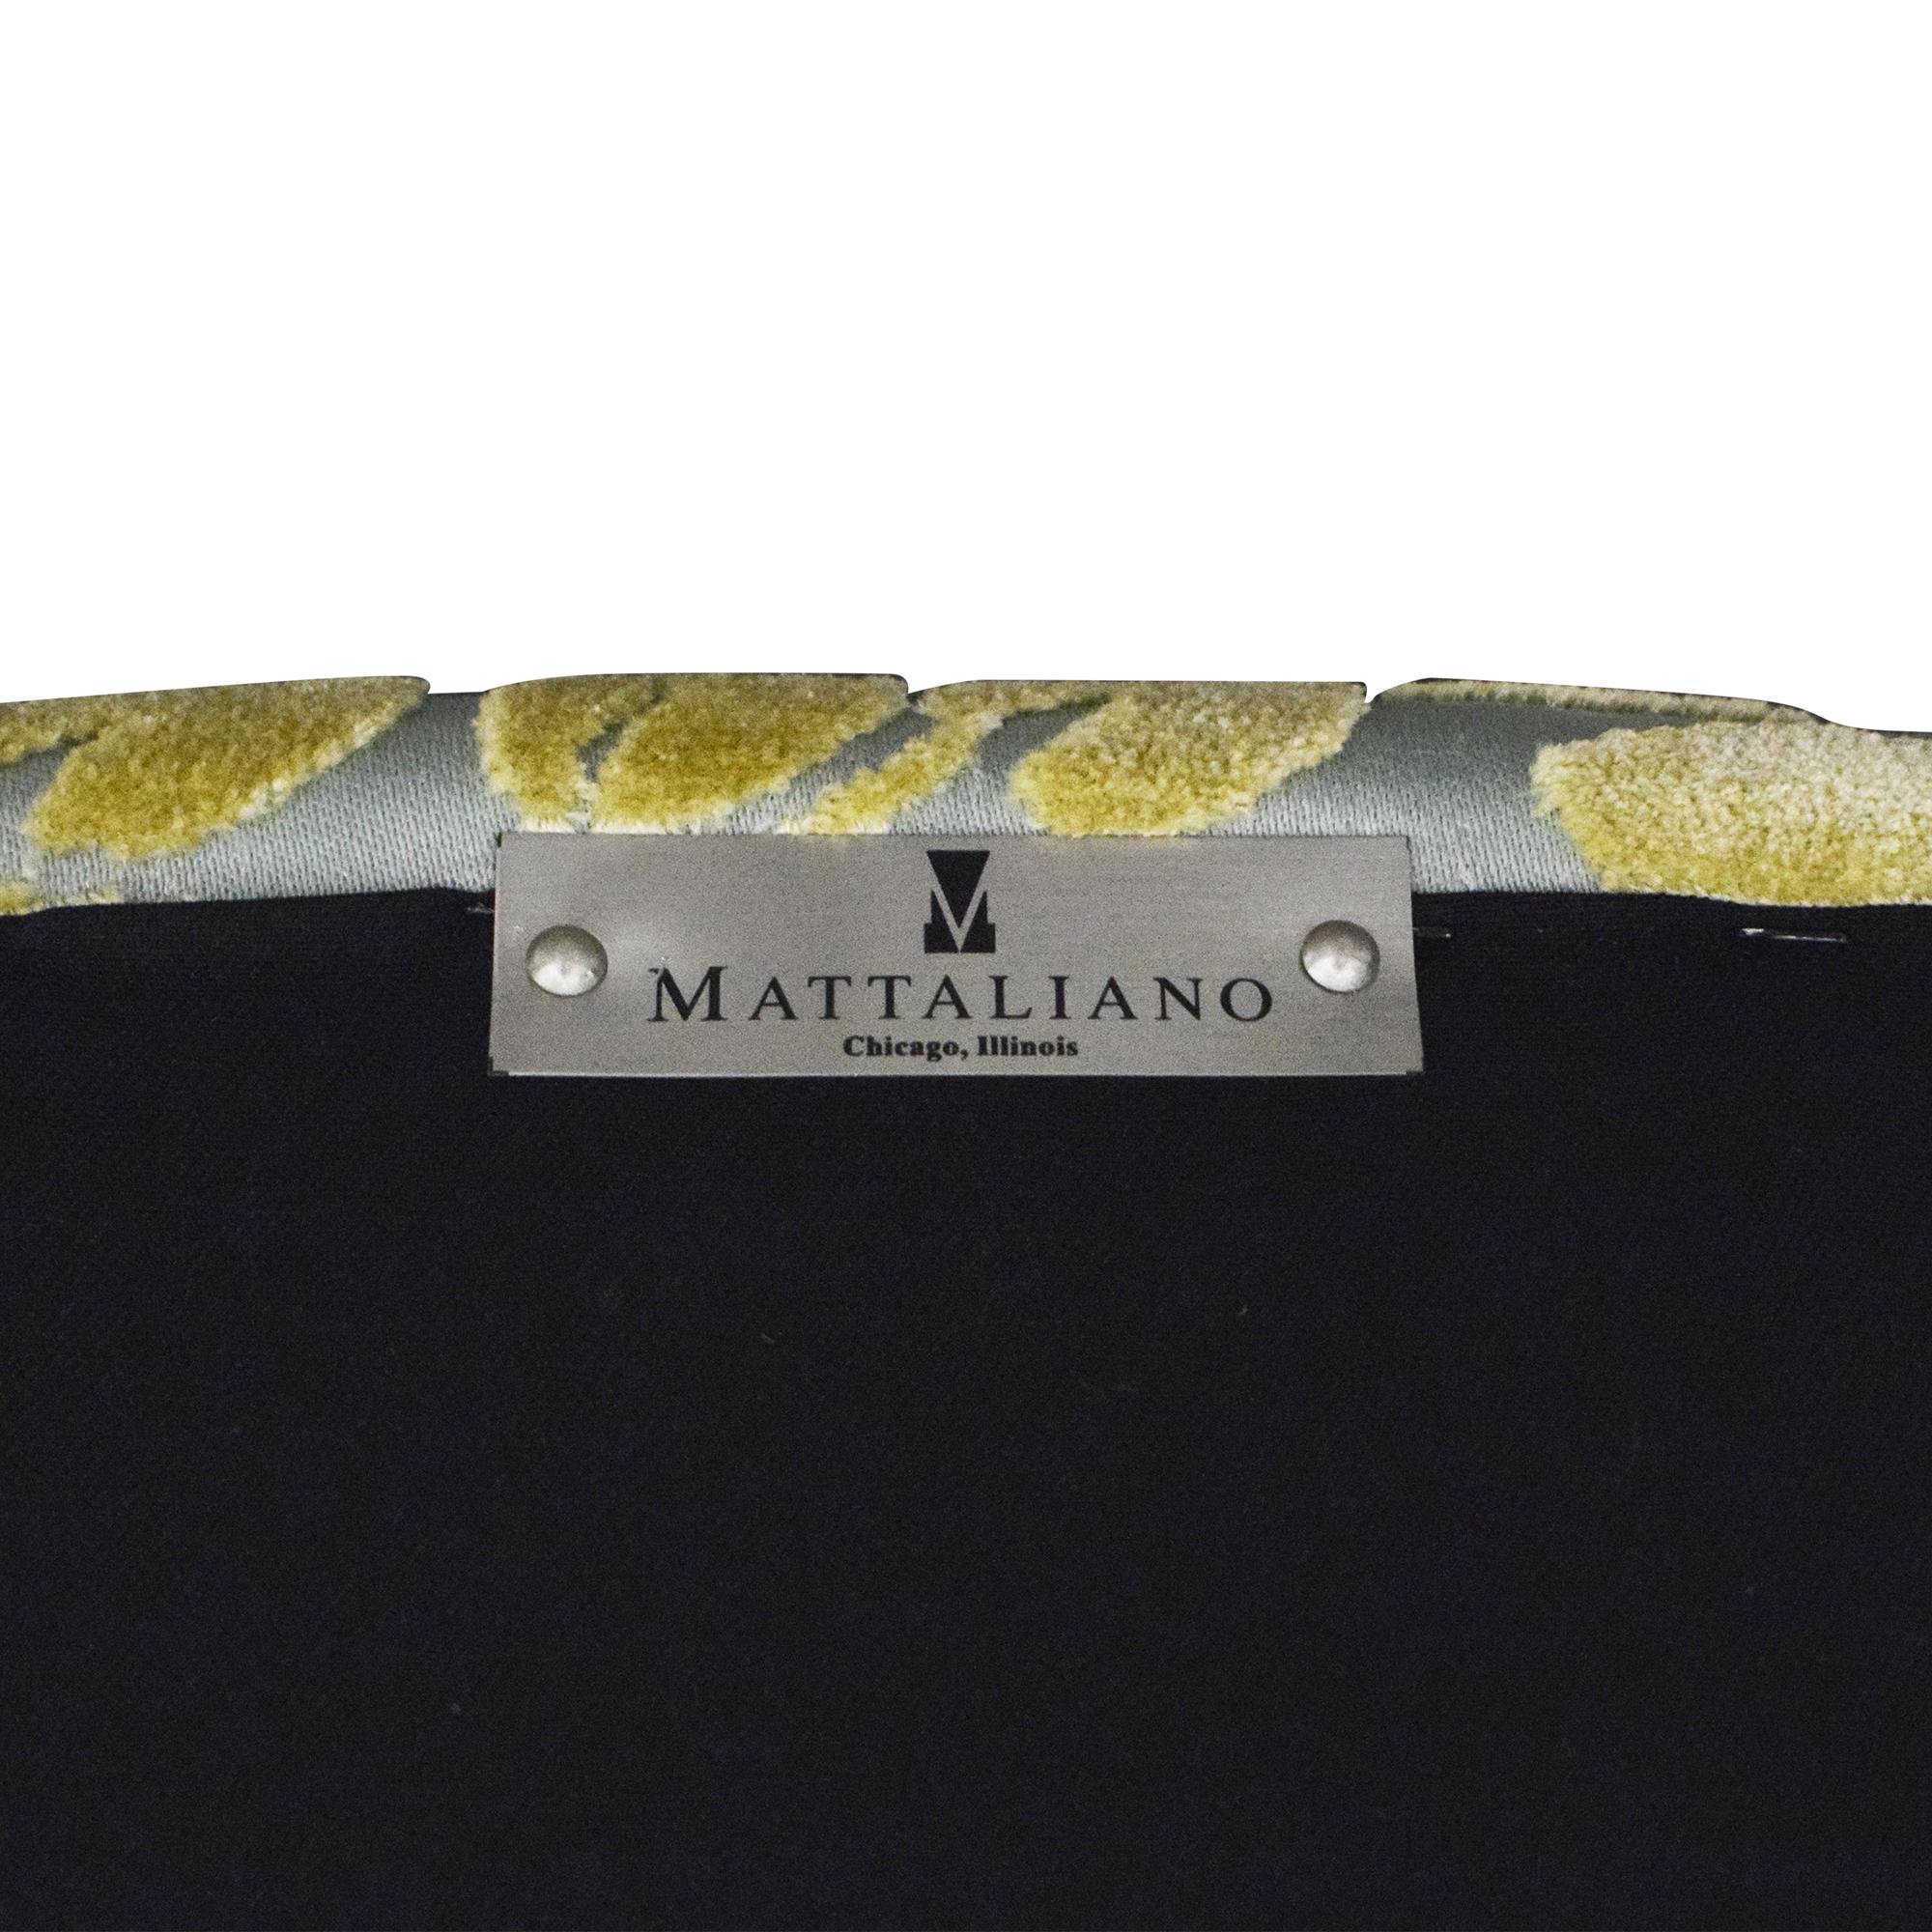 buy Mattaliano Flea Market #1 Dining Side Chairs Mattaliano